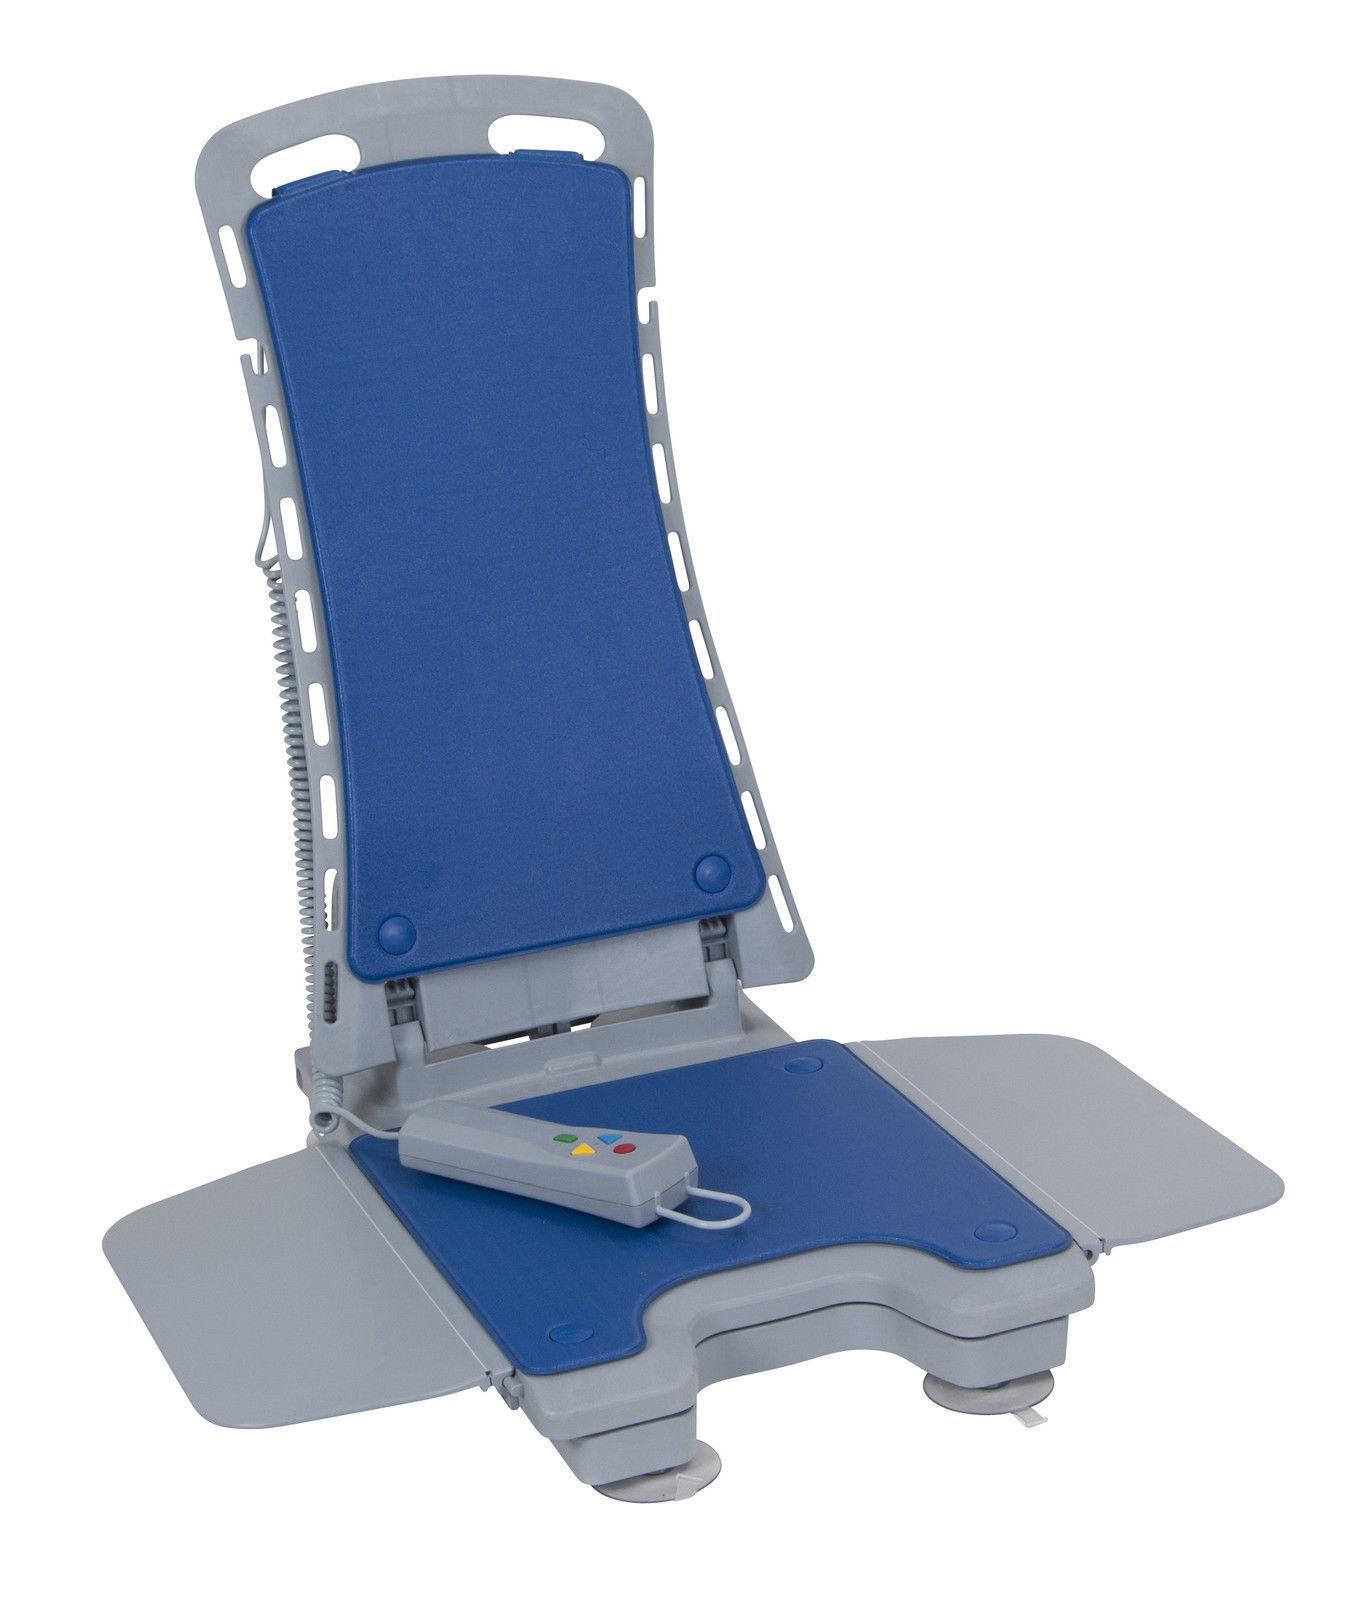 Drive Medical Blue Whisper Ultra Quiet Bathtub Lift Grey 477150312 ...